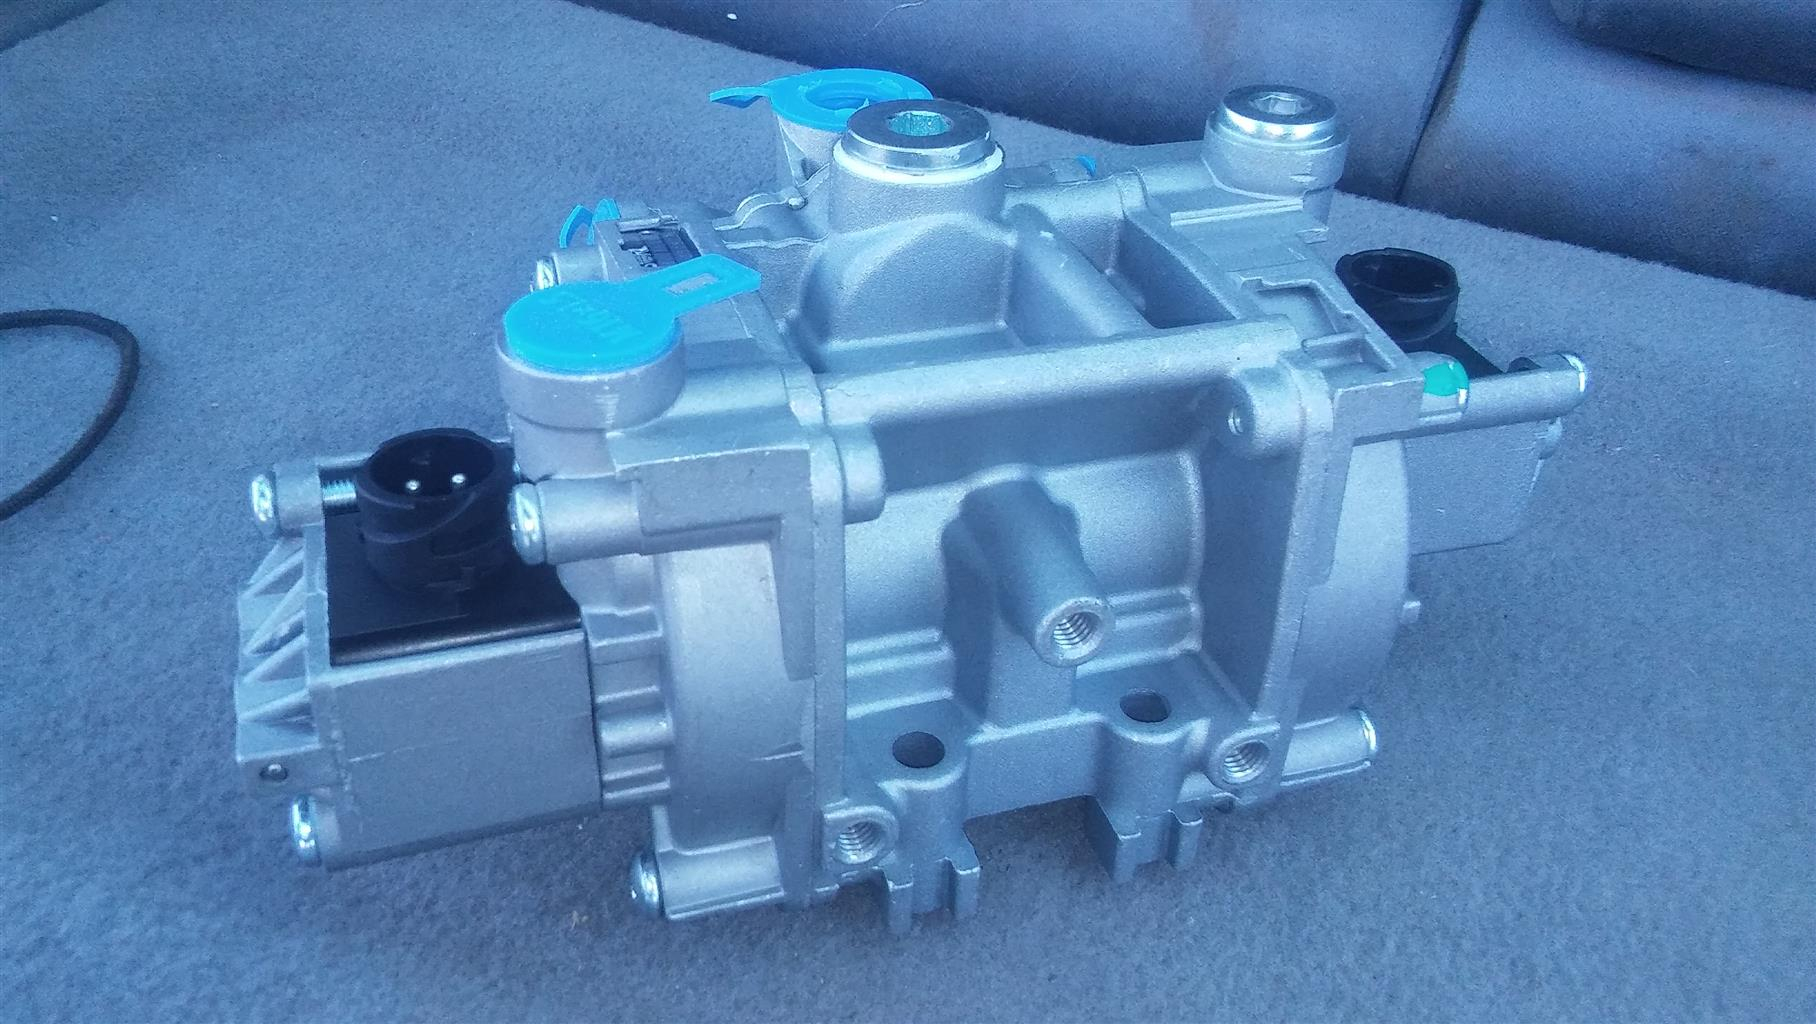 Air Brake Foot Valve Diagram Air Brake Spares Available Now Junk Mail